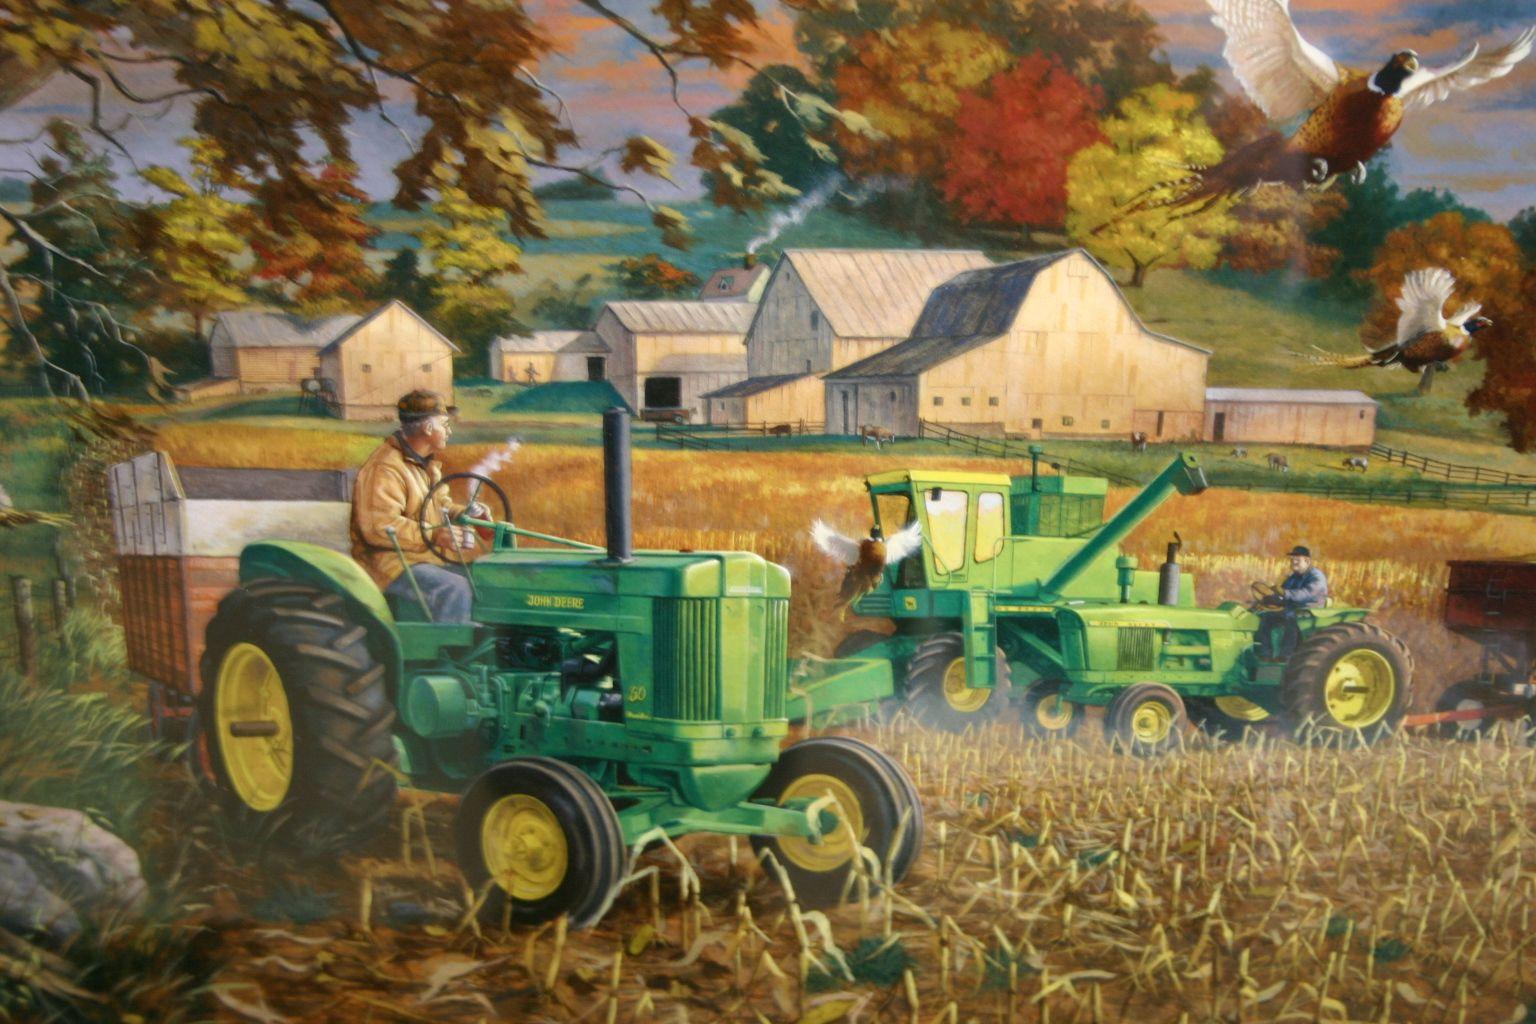 corn farming art prints - Bing Images | American Nostalgia ...